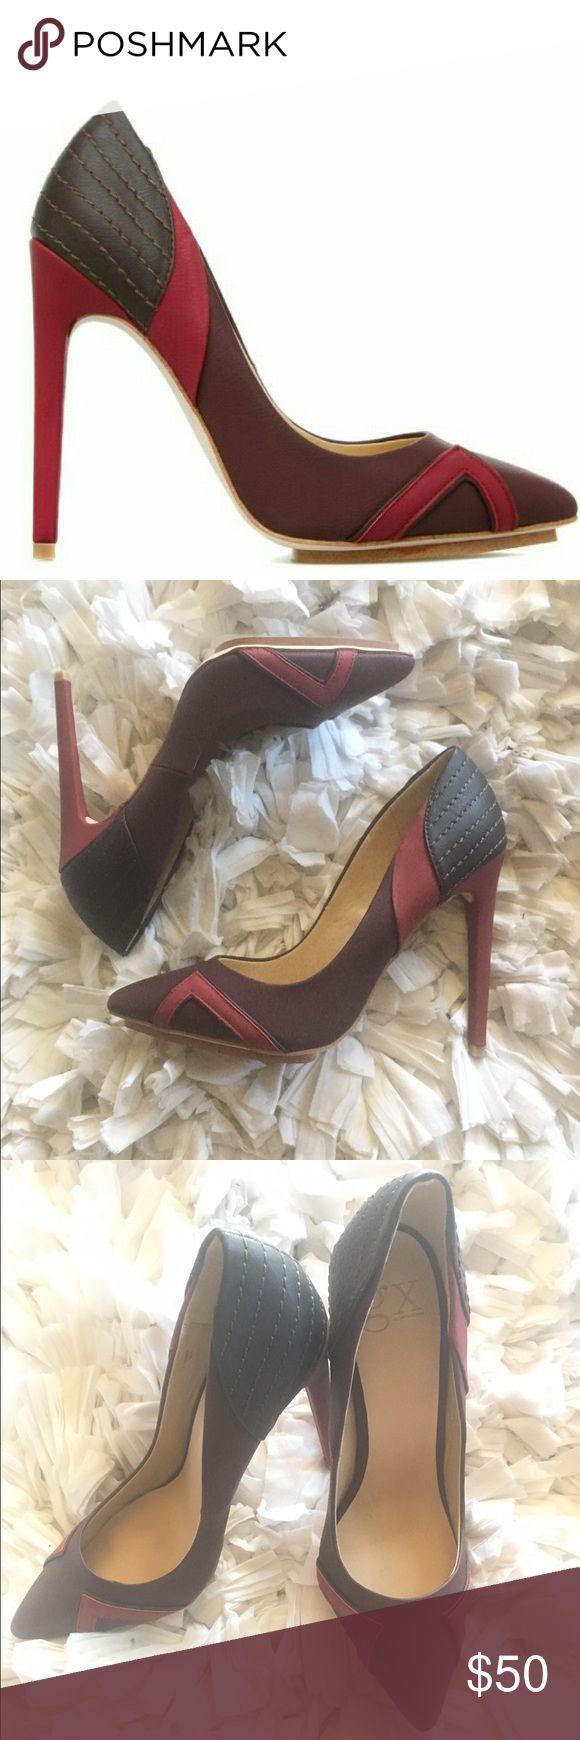 "GX by Gwen Stefani Yaro Heels NWOB GX by Gwen Stefani ""Yaro""//Absolutely beautiful heels//Heel is 4""//Fits narrow//Never been worn//New w/o box//Tiny ding on heel from storage(pictured). GX by Gwen Stefani Shoes Heels"